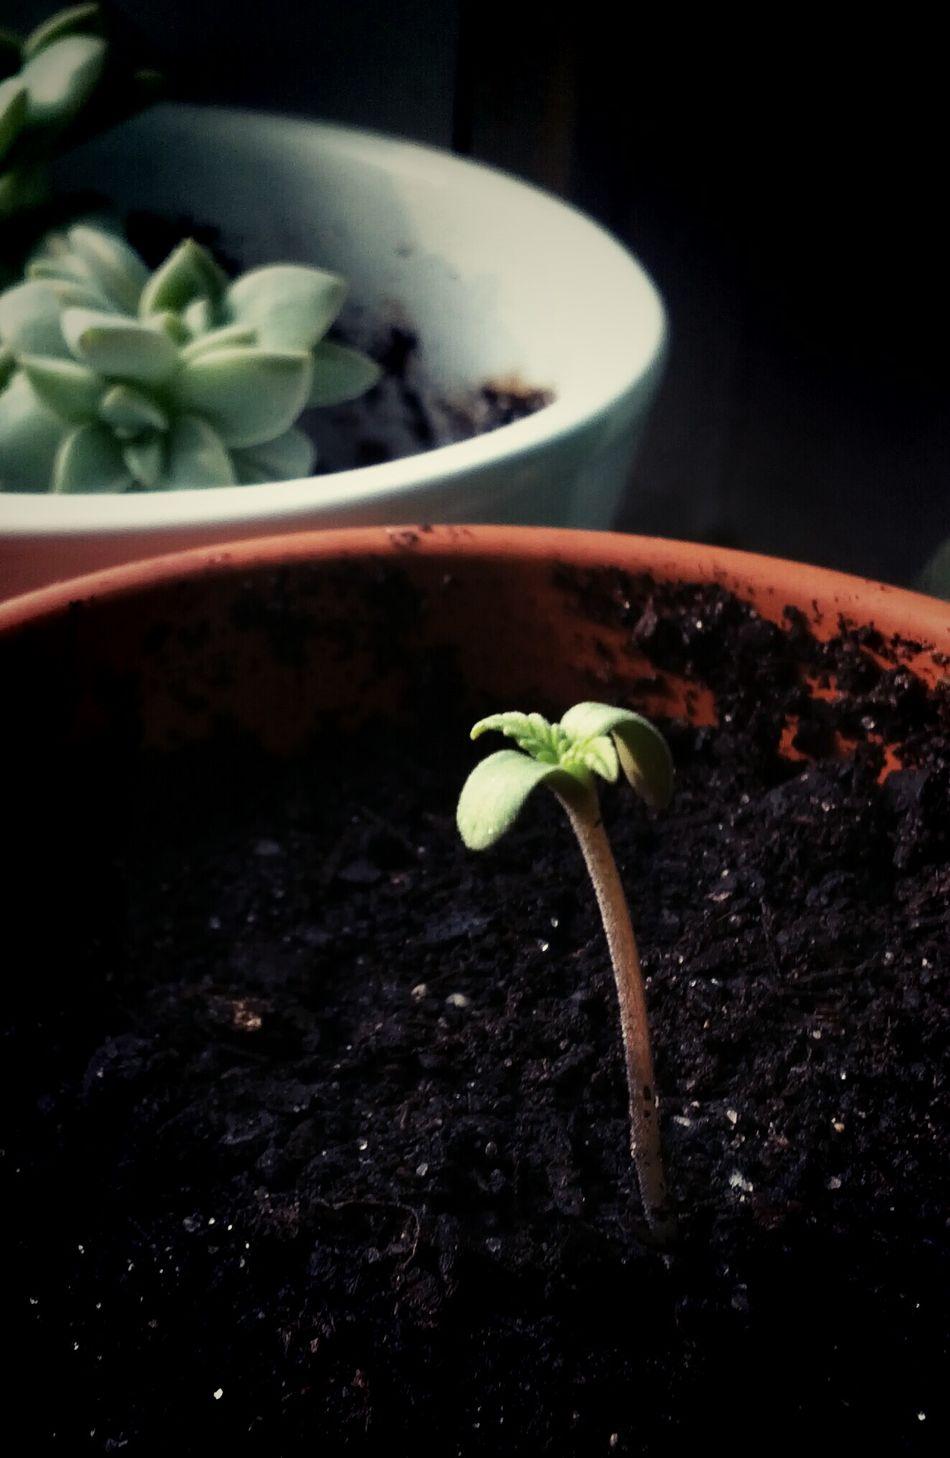 Watching Plants Grow Growing Plants Marijuana Grow Slow